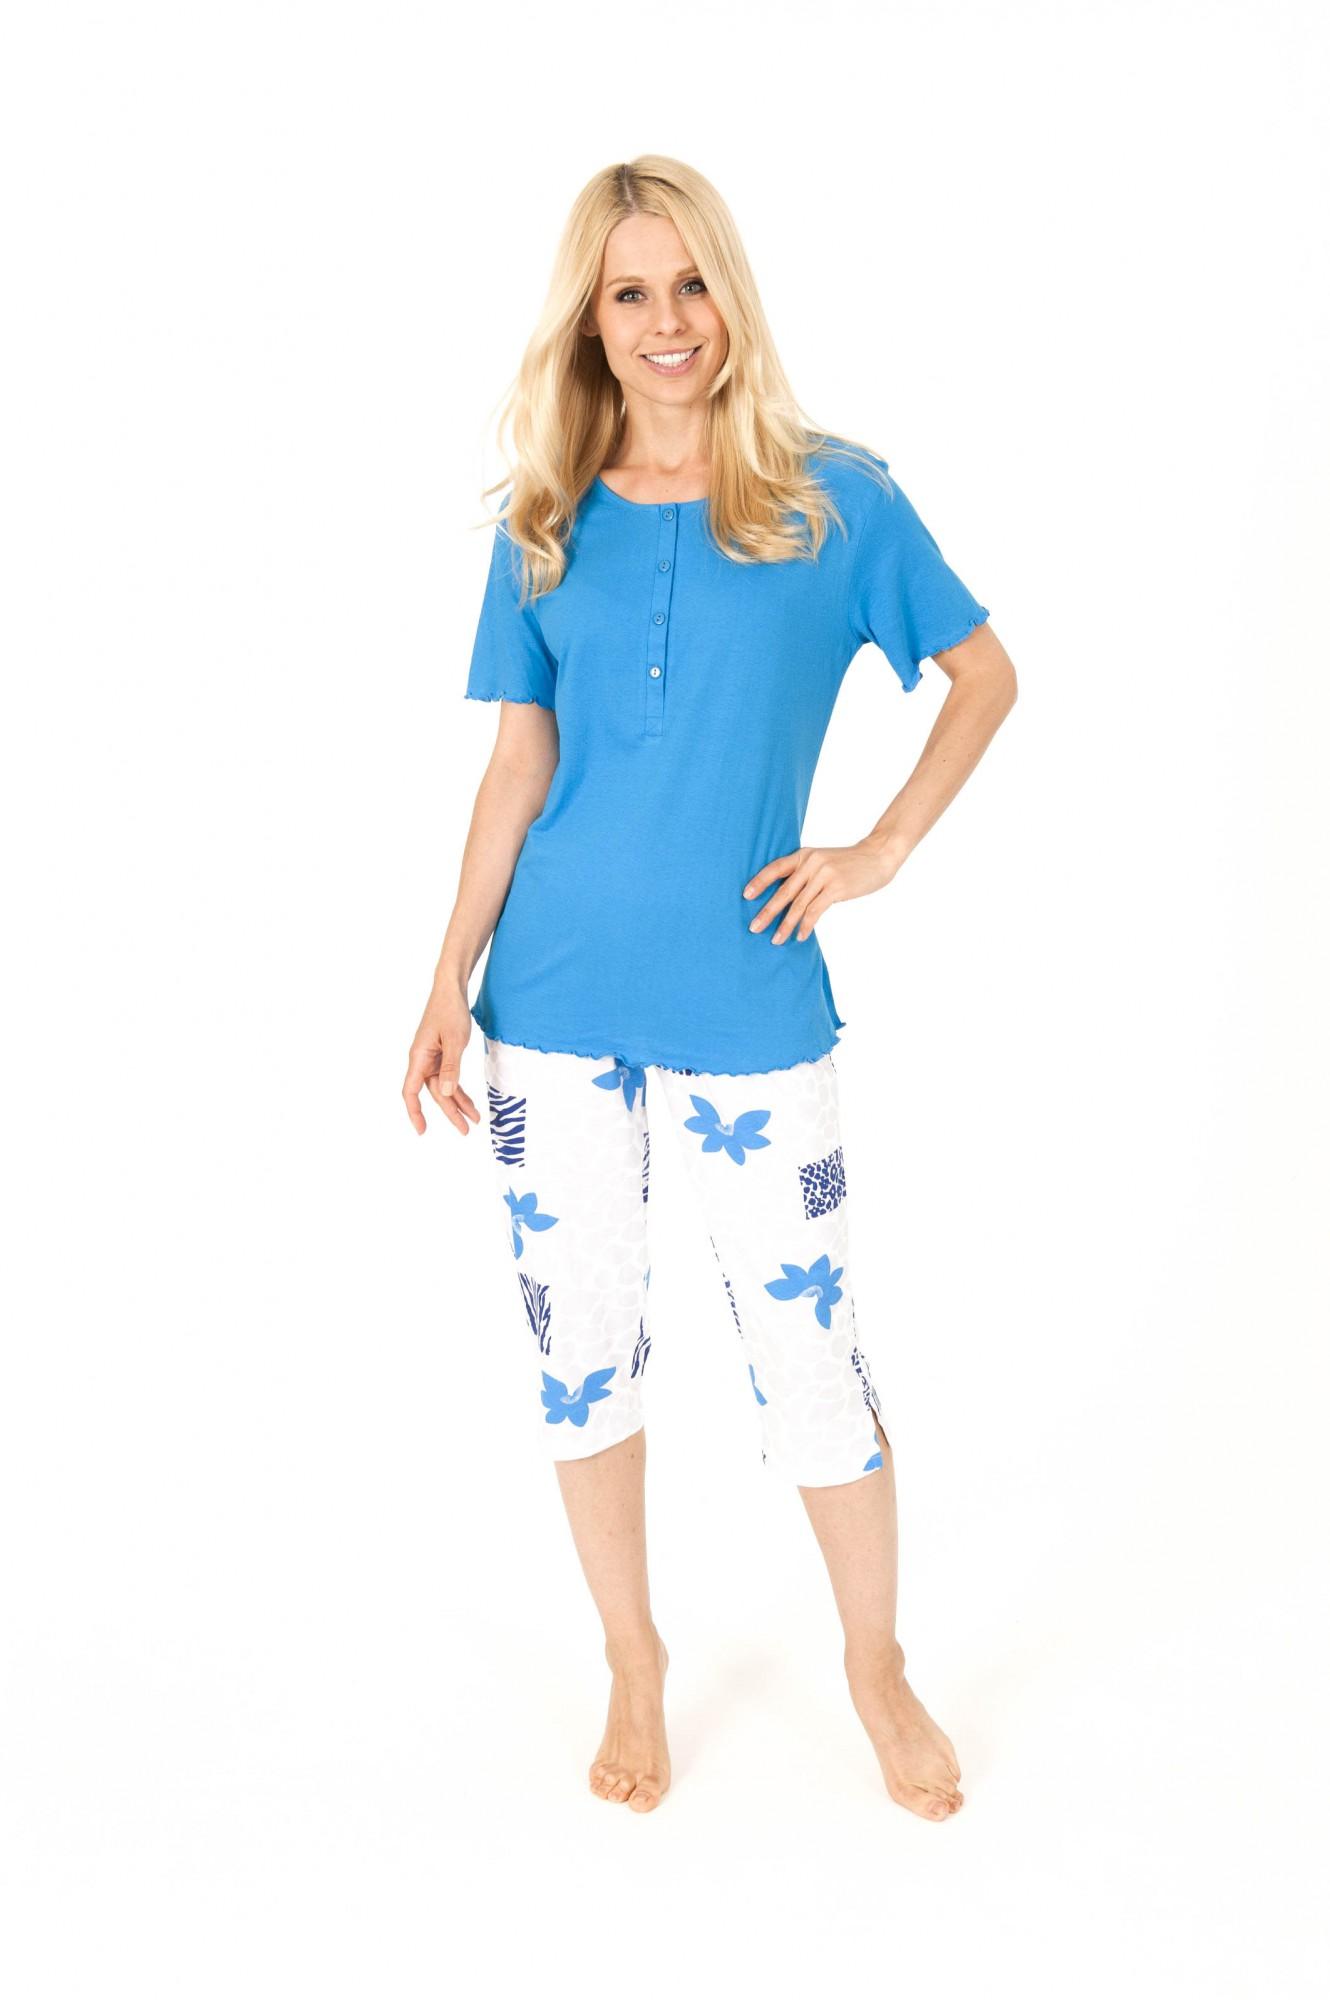 Damen Capri Pyjama kurzarm Schlafanzug mit Knopfleiste – 161 204 90 815 001